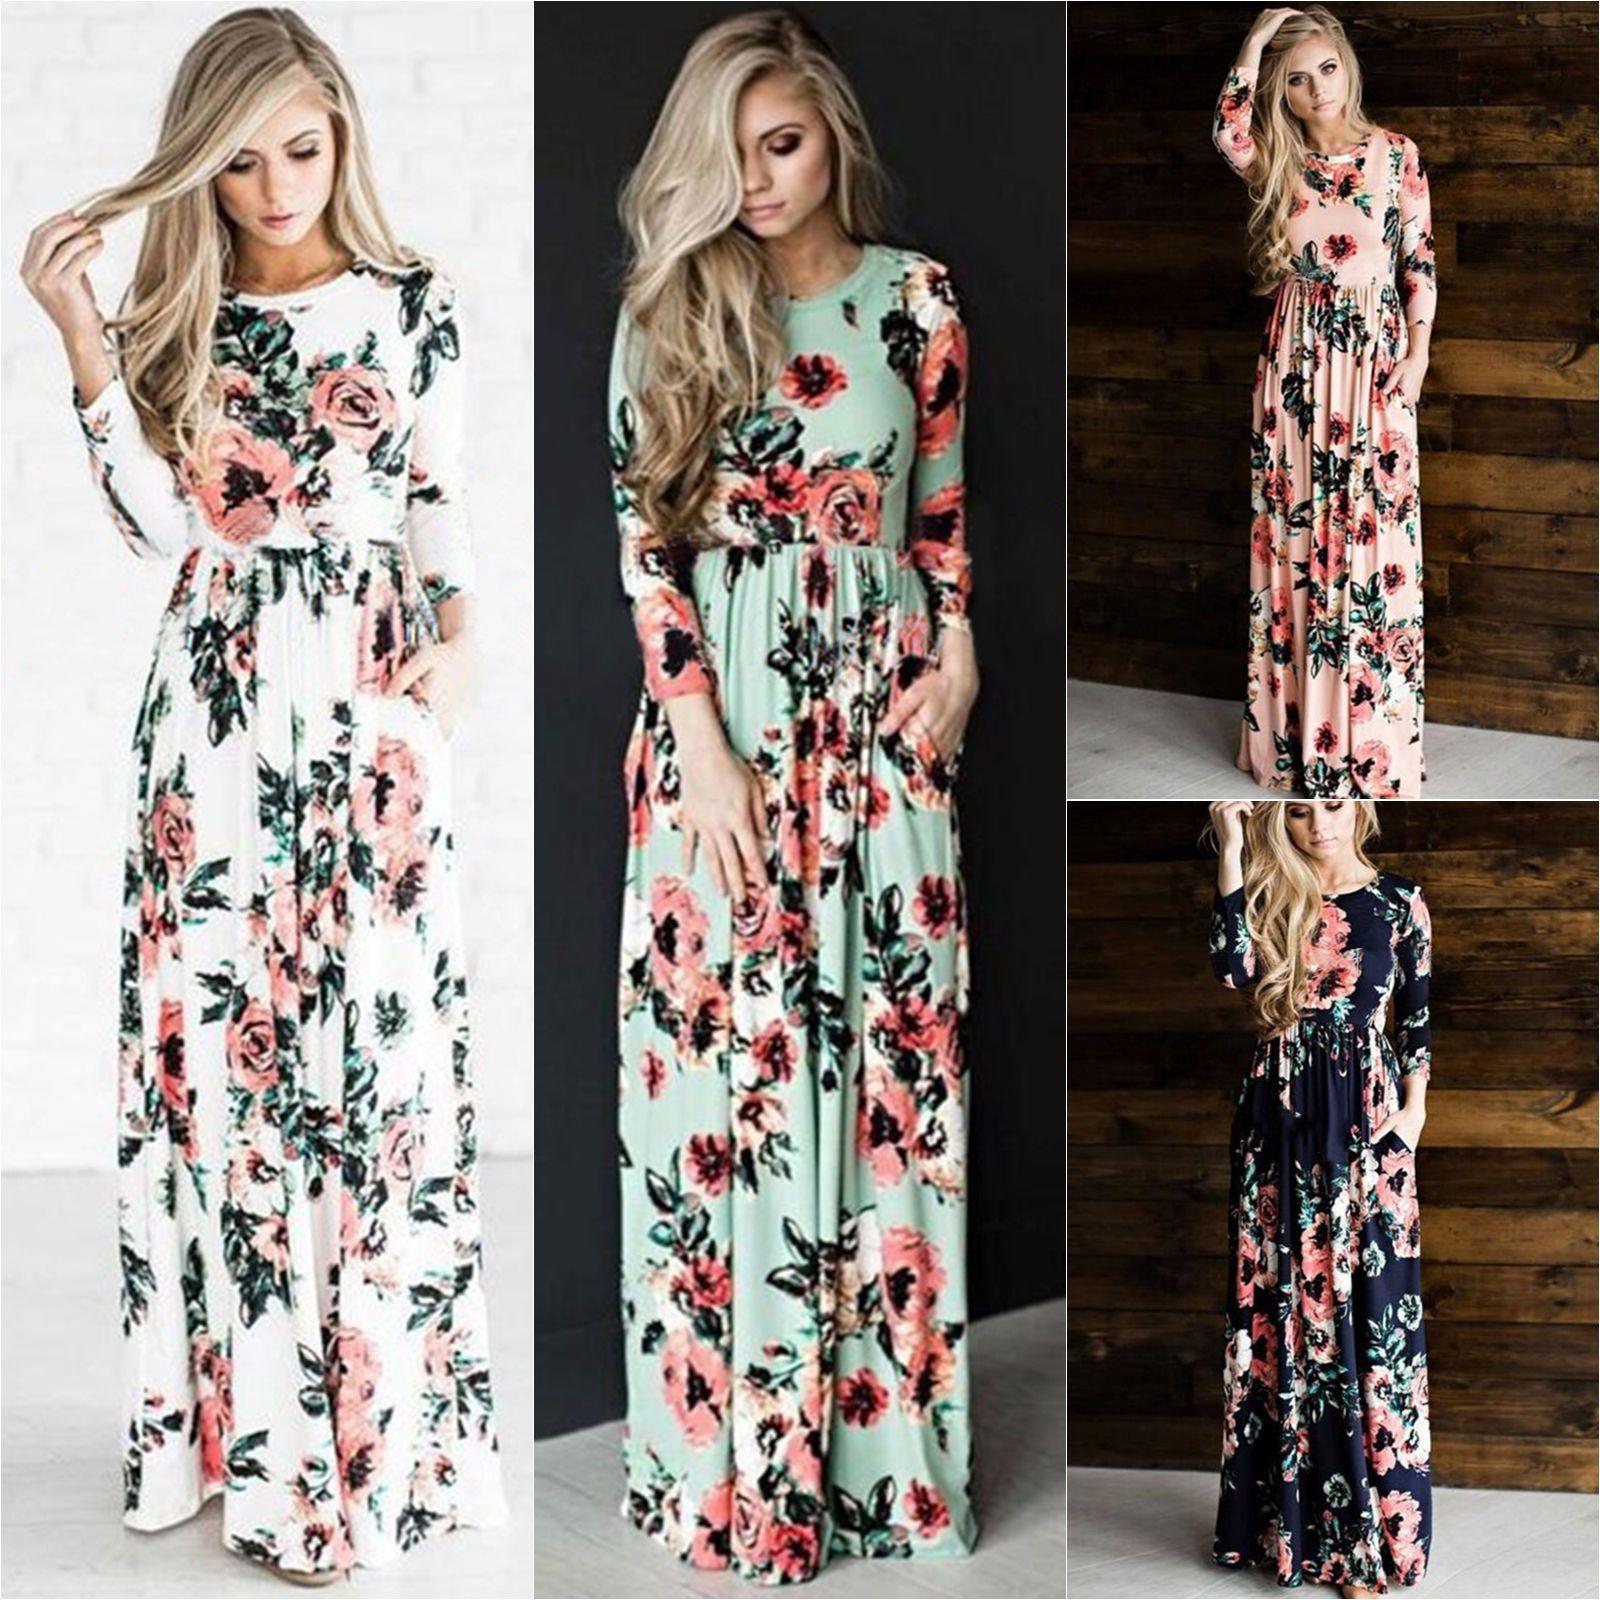 Acquista Boho Womens Retro Floral Long Maxi Dress Manica Lunga Party Casual  Vintage Summer Beach Girocollo Flower Sundress A  12.56 Dal Erinzhang  20901a73814